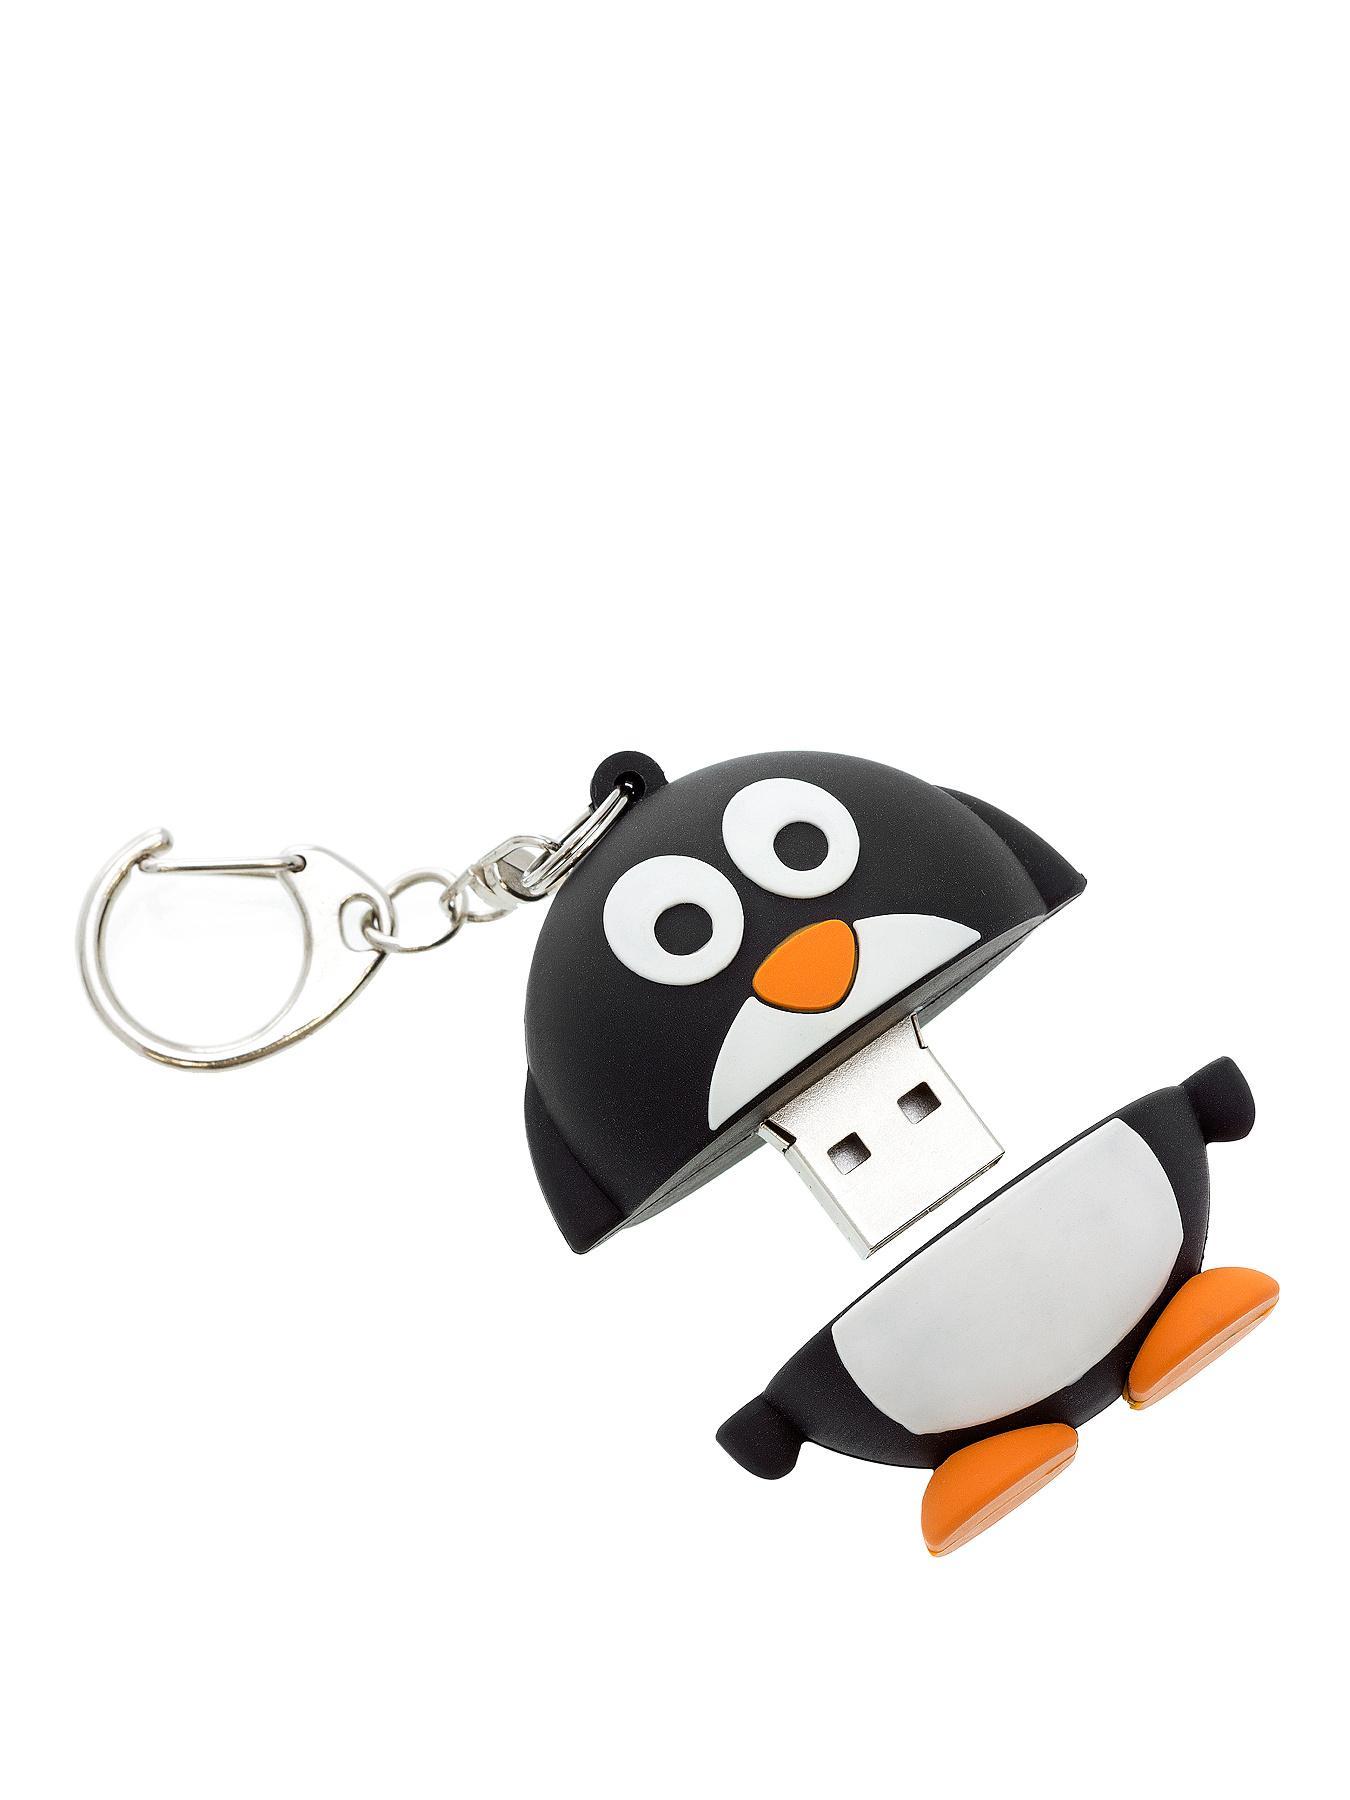 Trendz 8Gb Character Penguin USB Drive